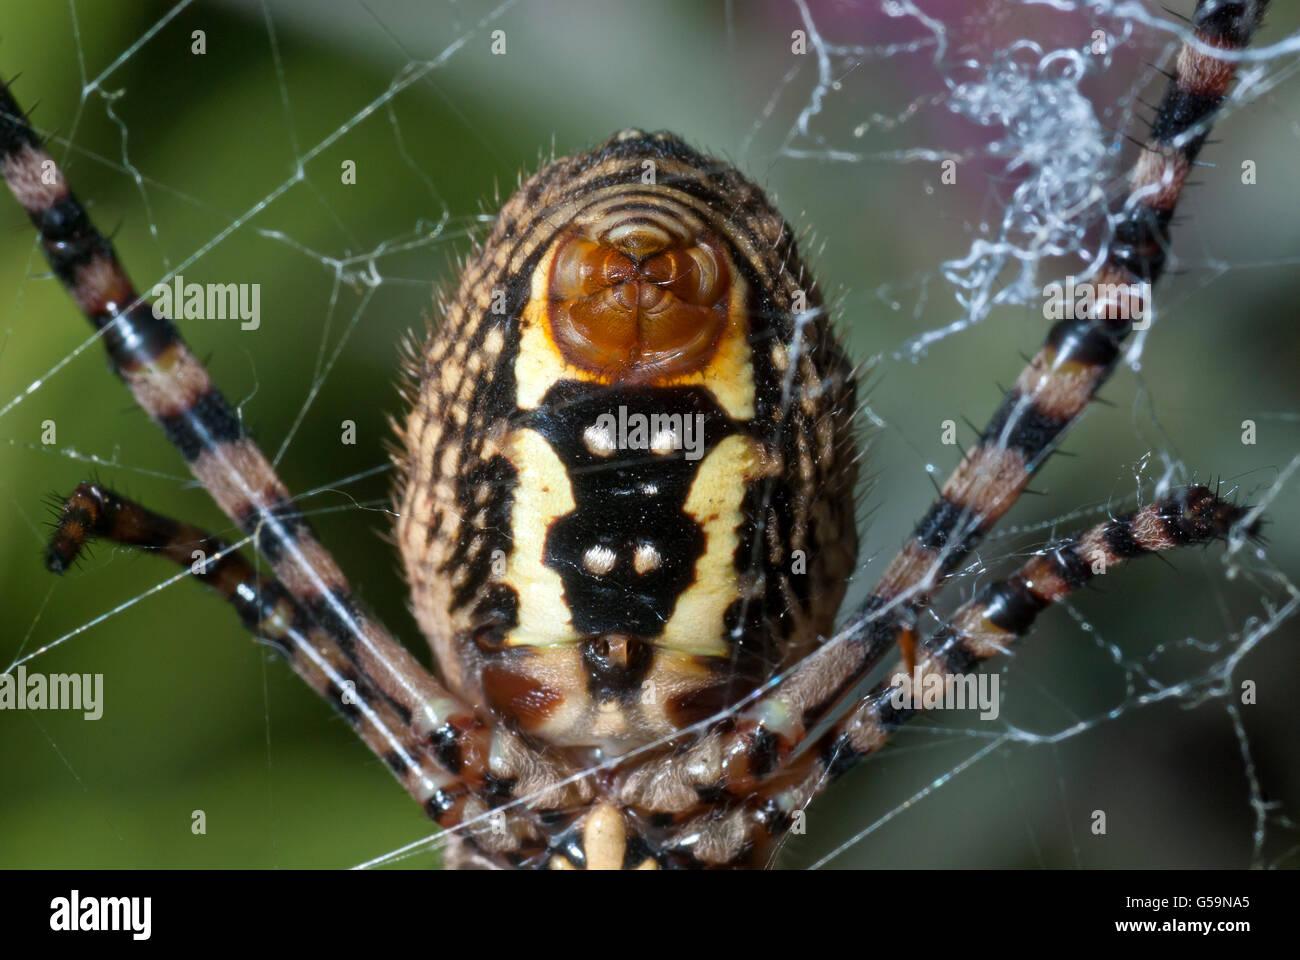 Araña, cerca del órgano - spinneret web Imagen De Stock